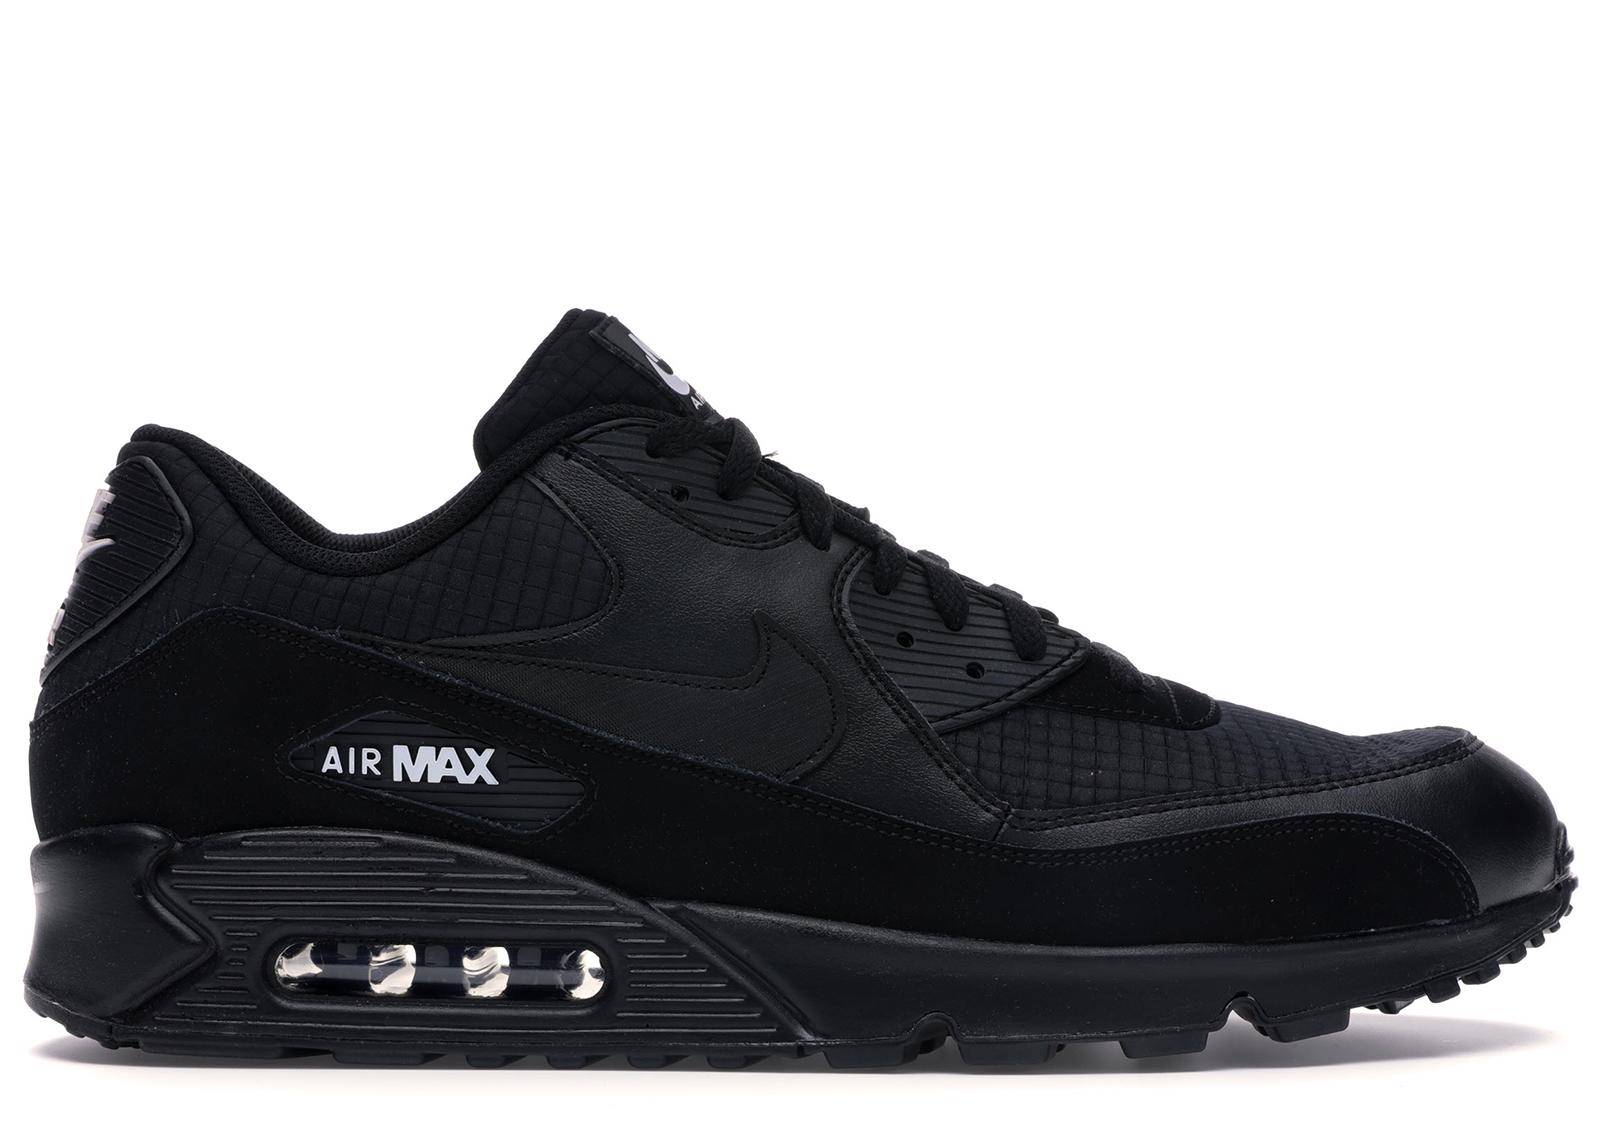 Nike Air Max 90 Black White (2019